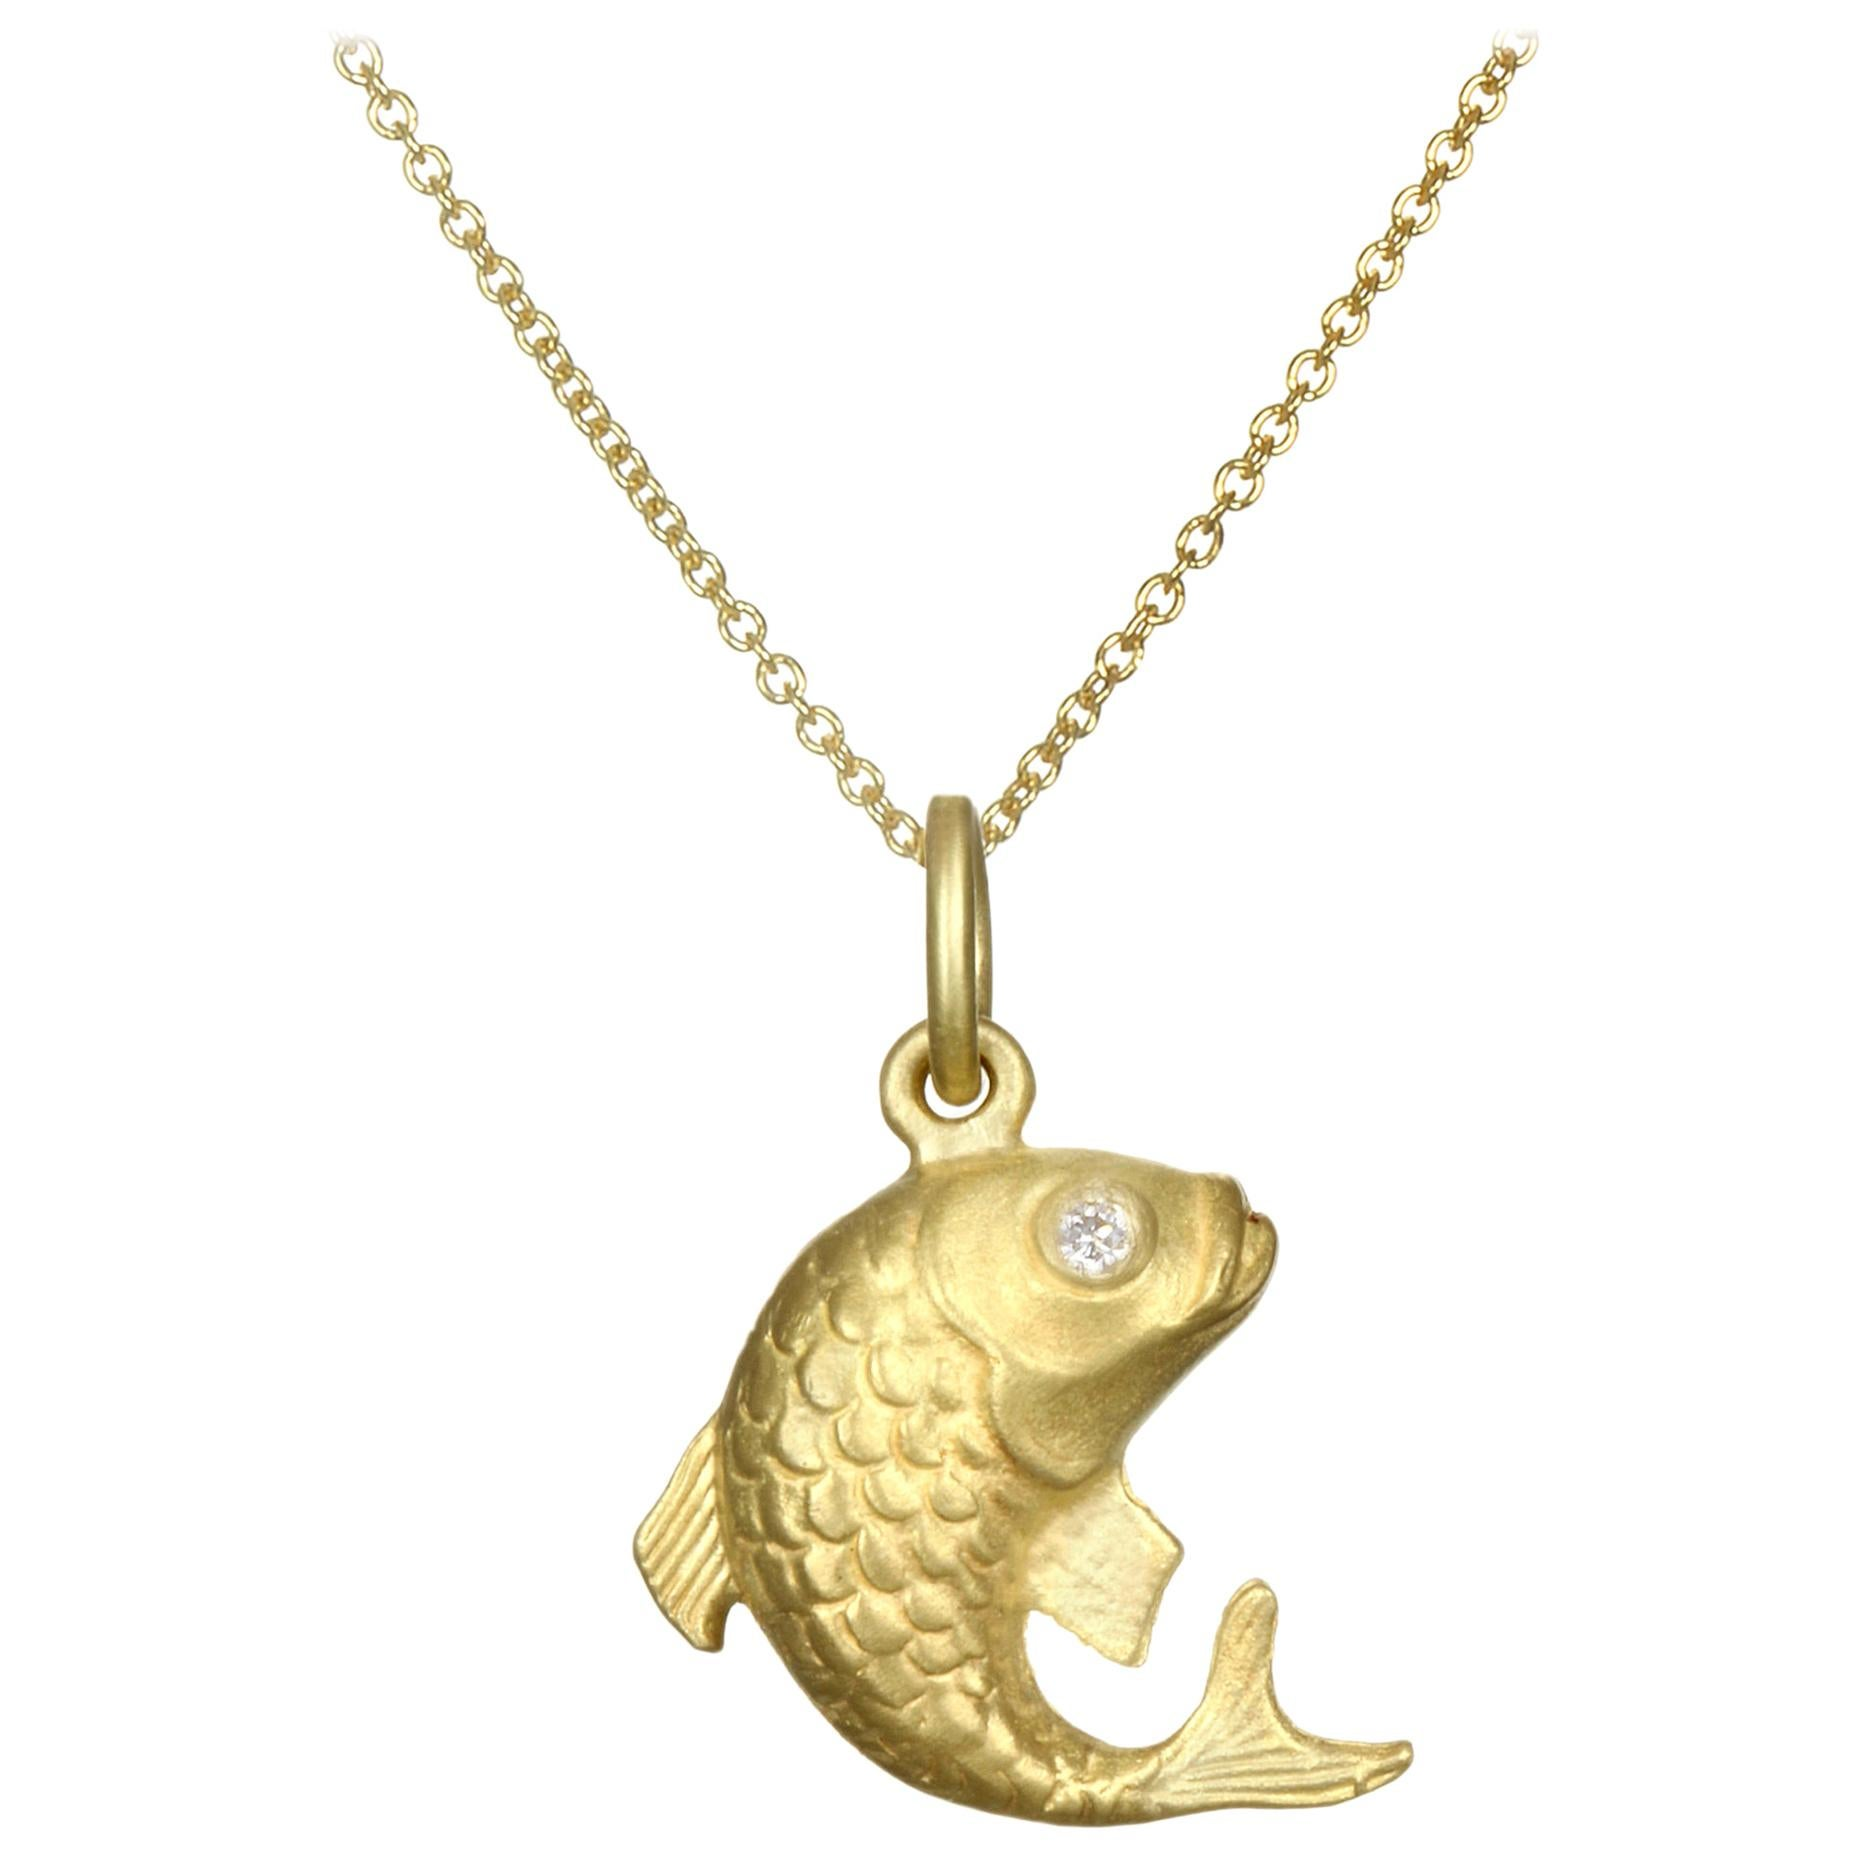 Faye Kim 18 Karat Gold Koi Fish Charm Necklace